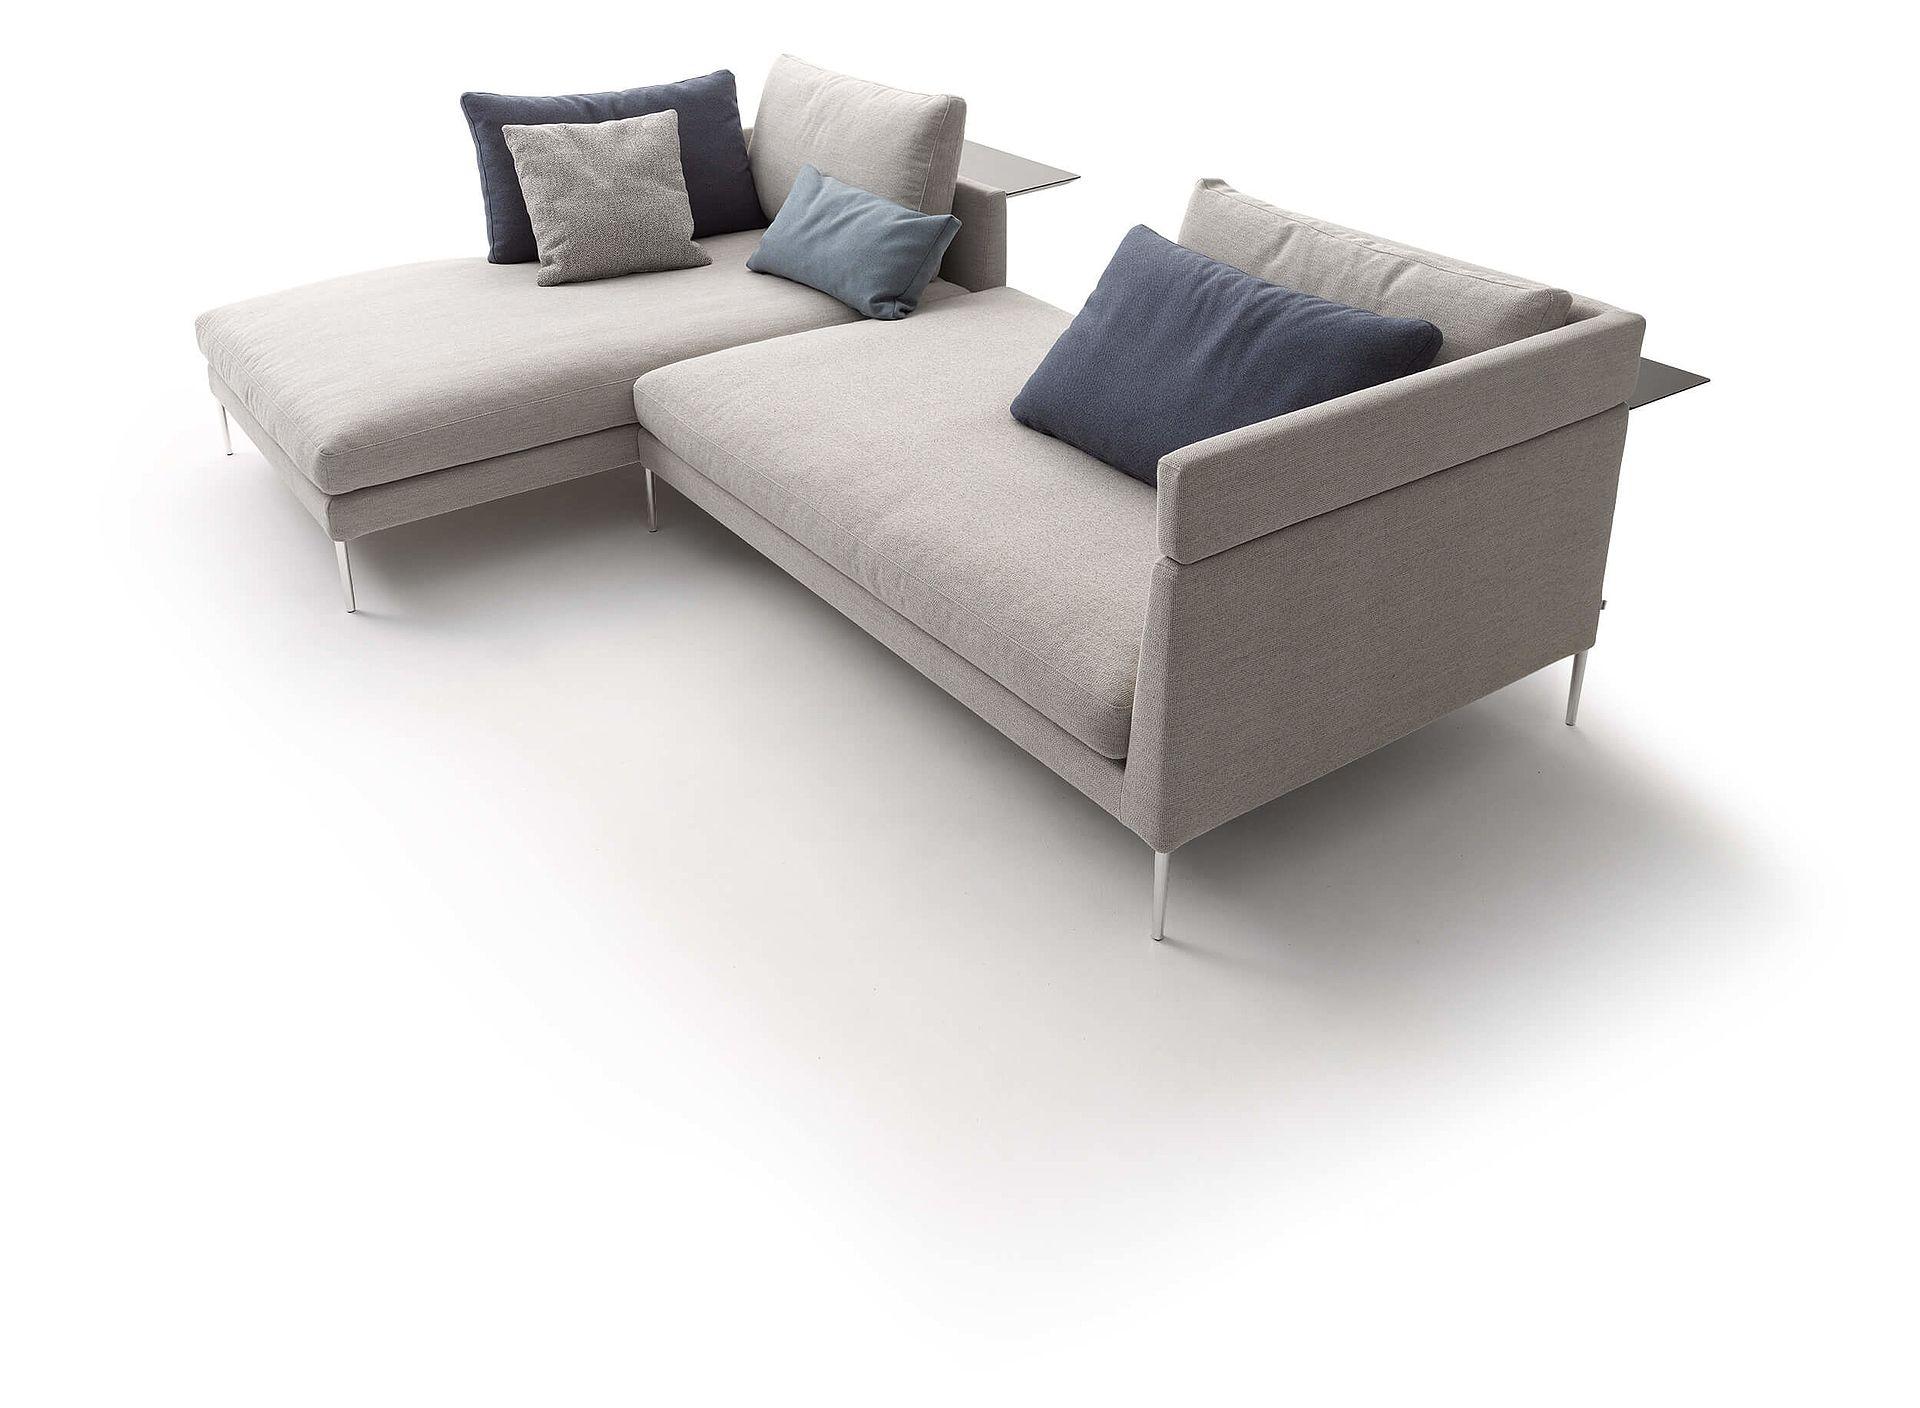 Name Pilotis sofa Designer Metrica Manufacturer COR